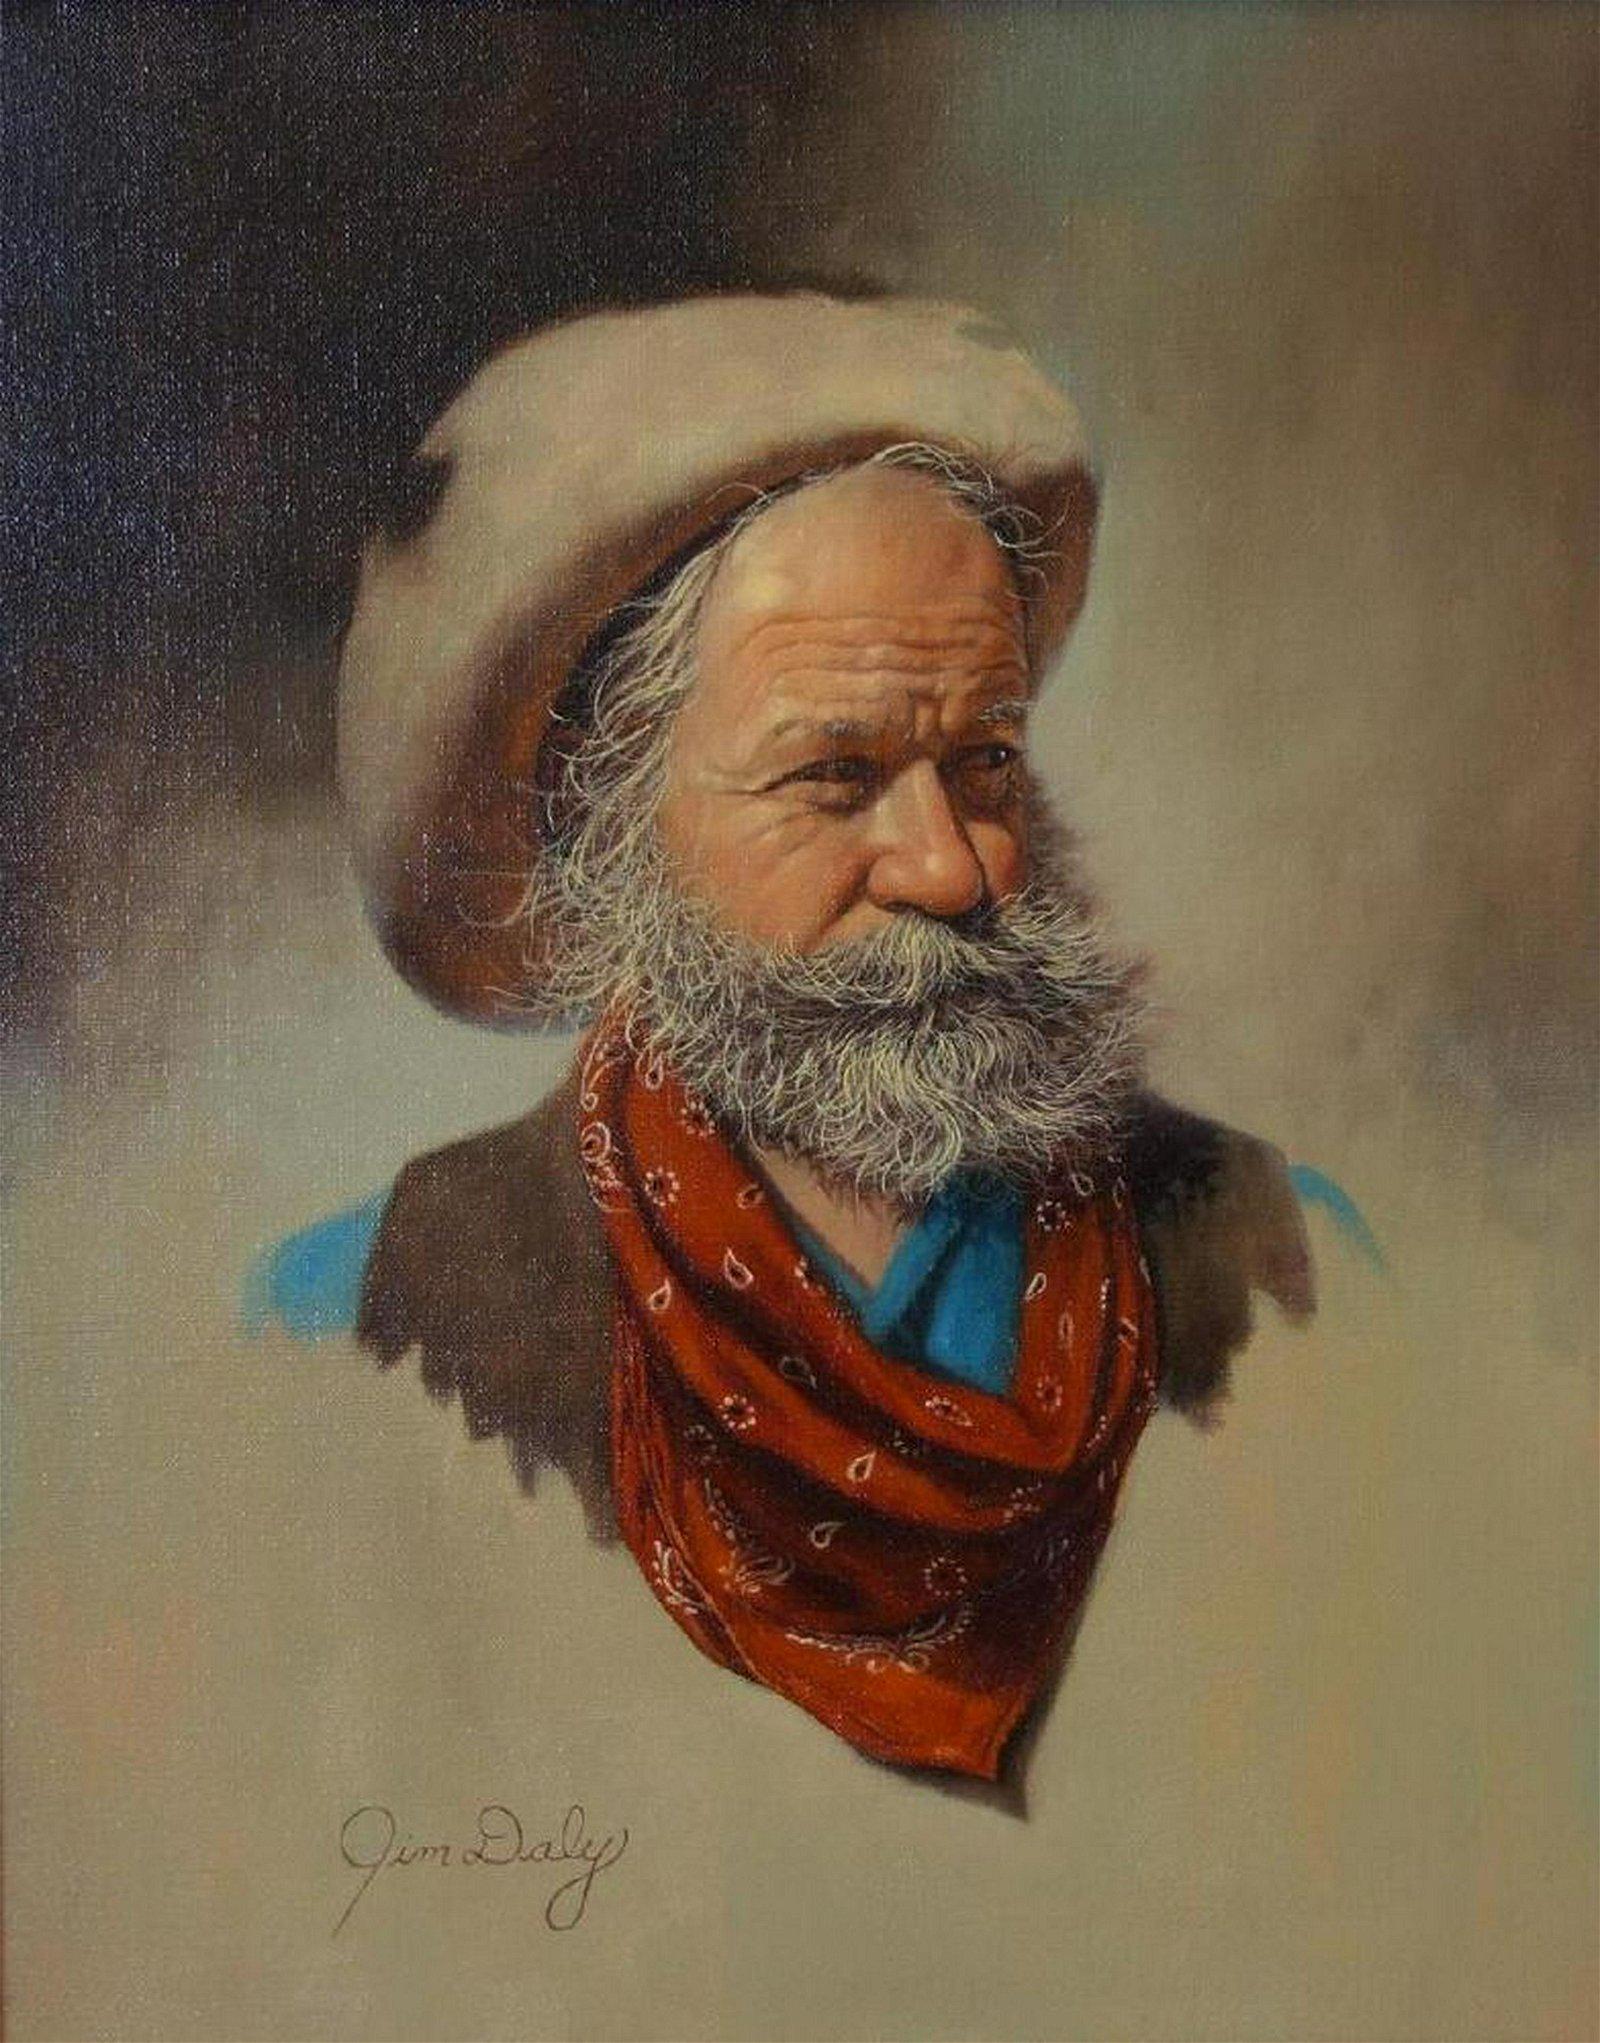 Jim Daly (b-1940) Cowboy Portrait